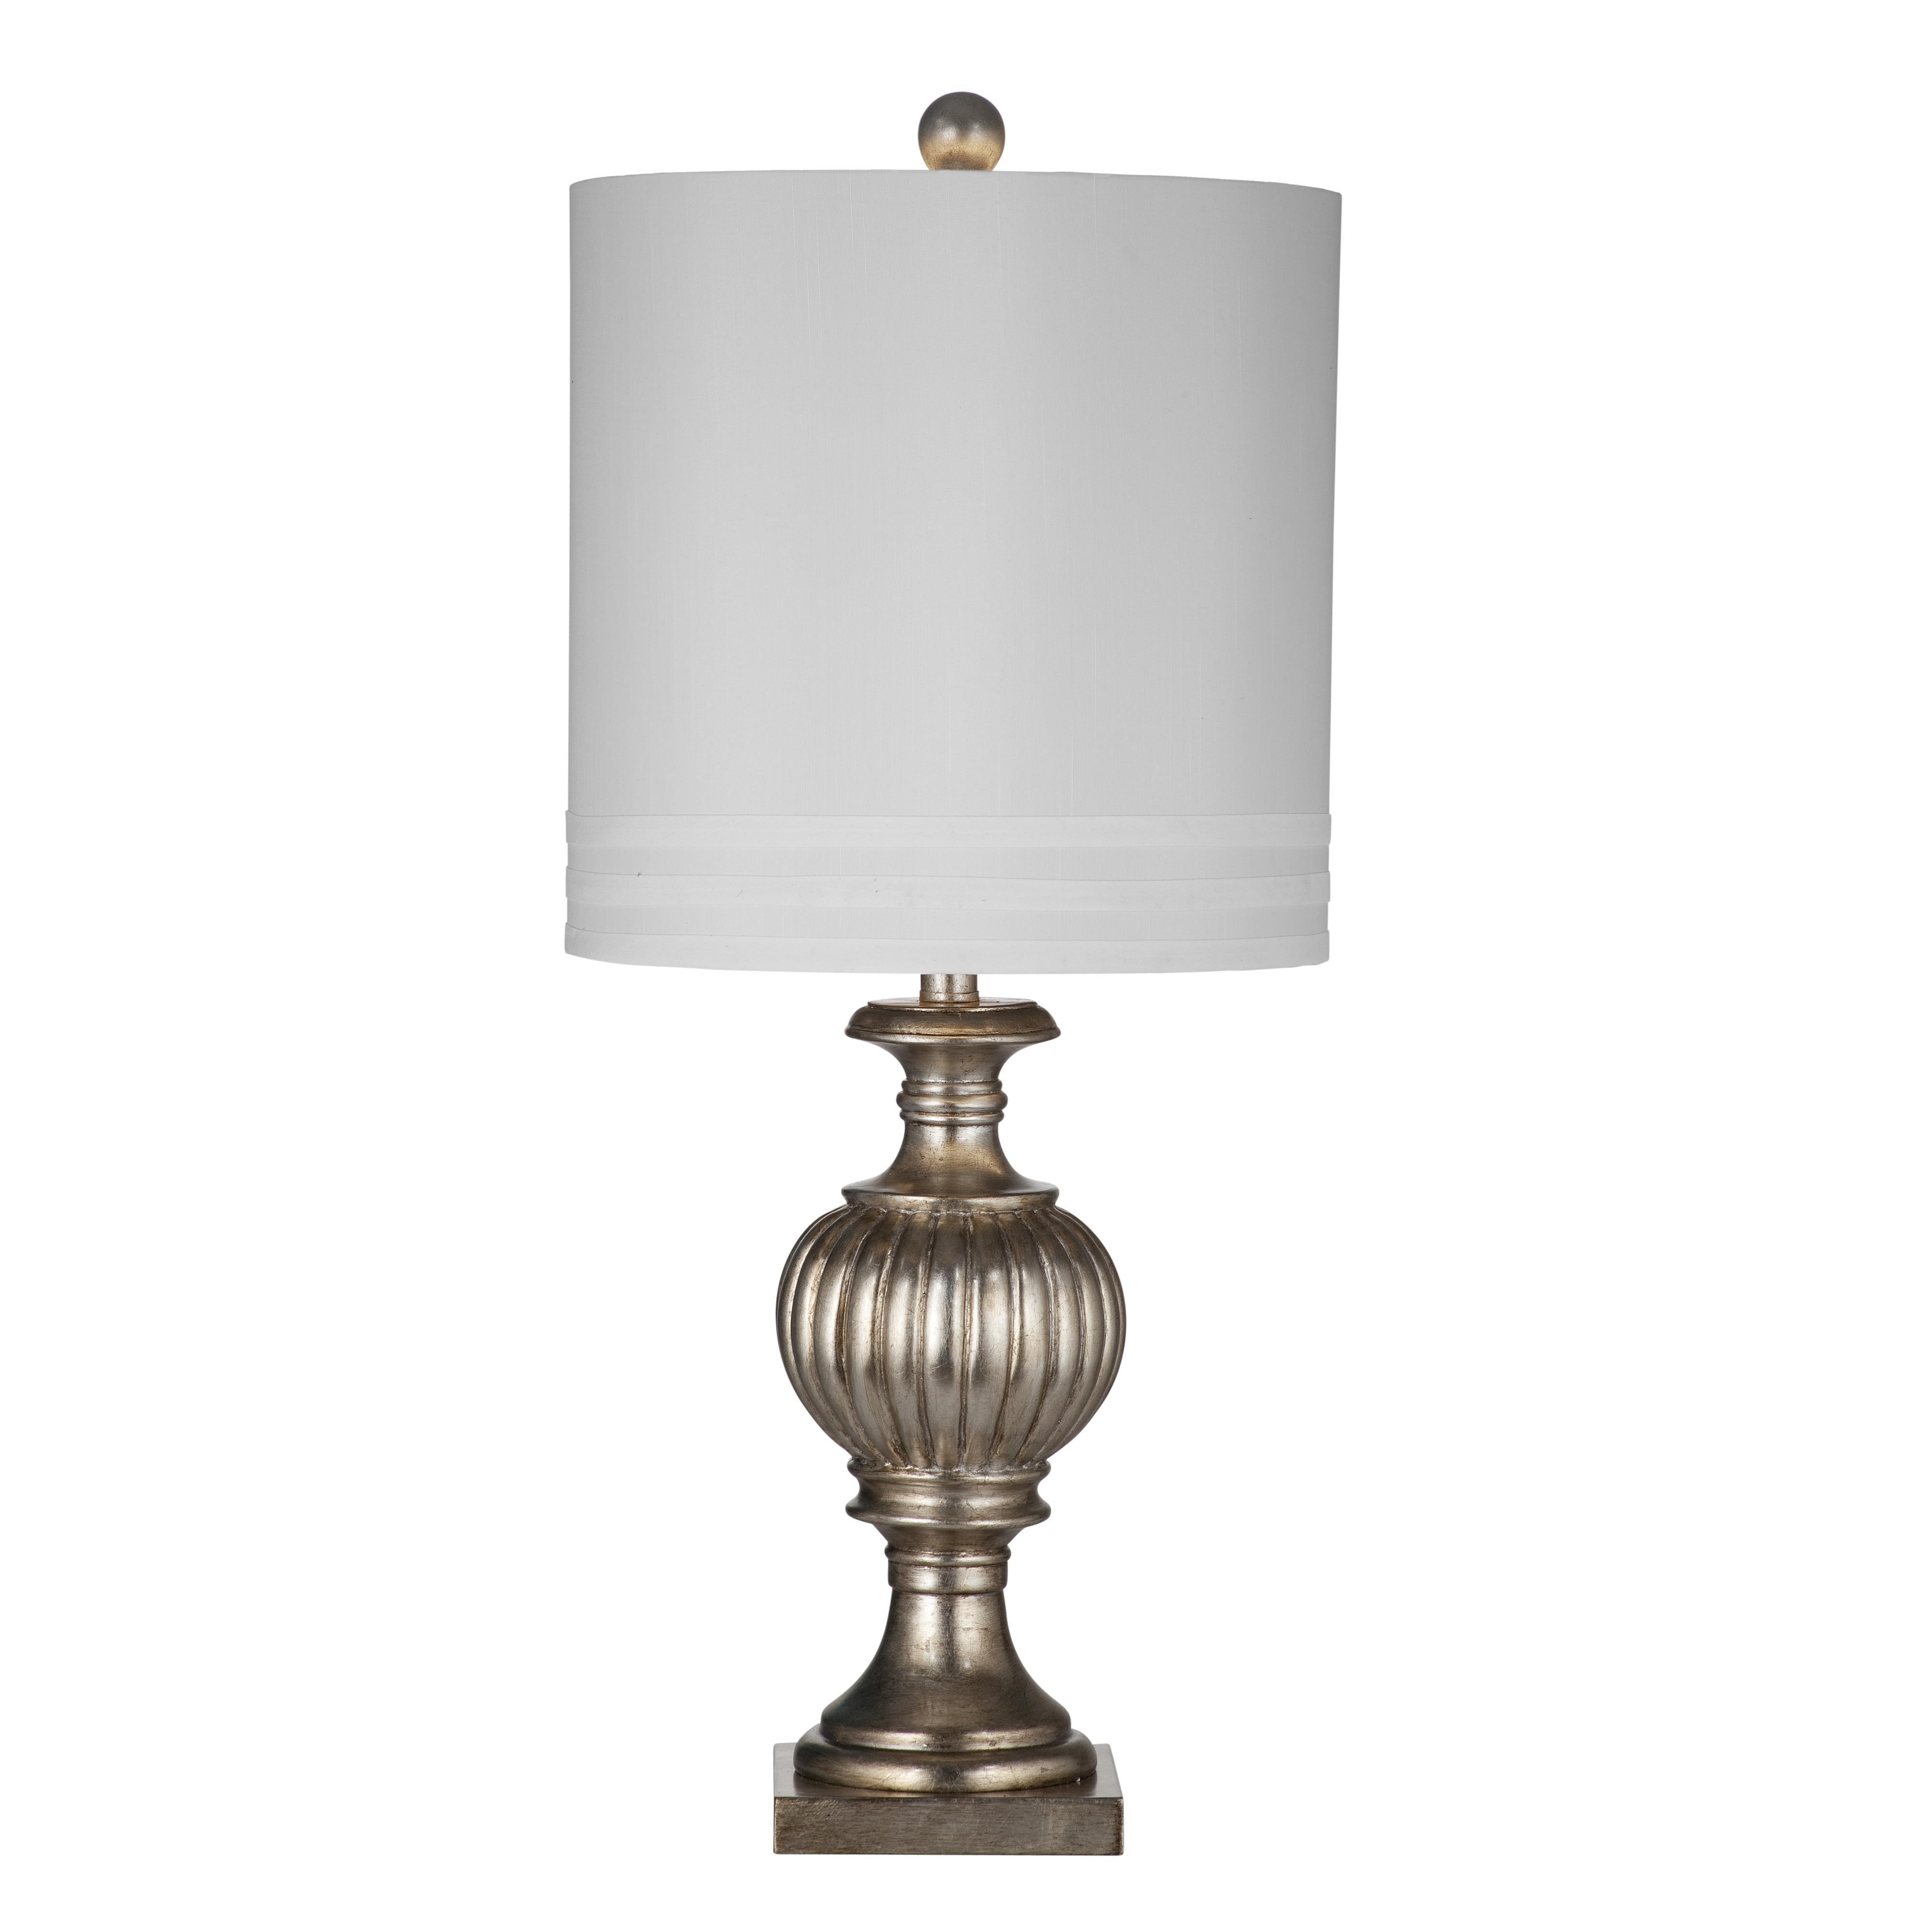 Senoia Table Lamp